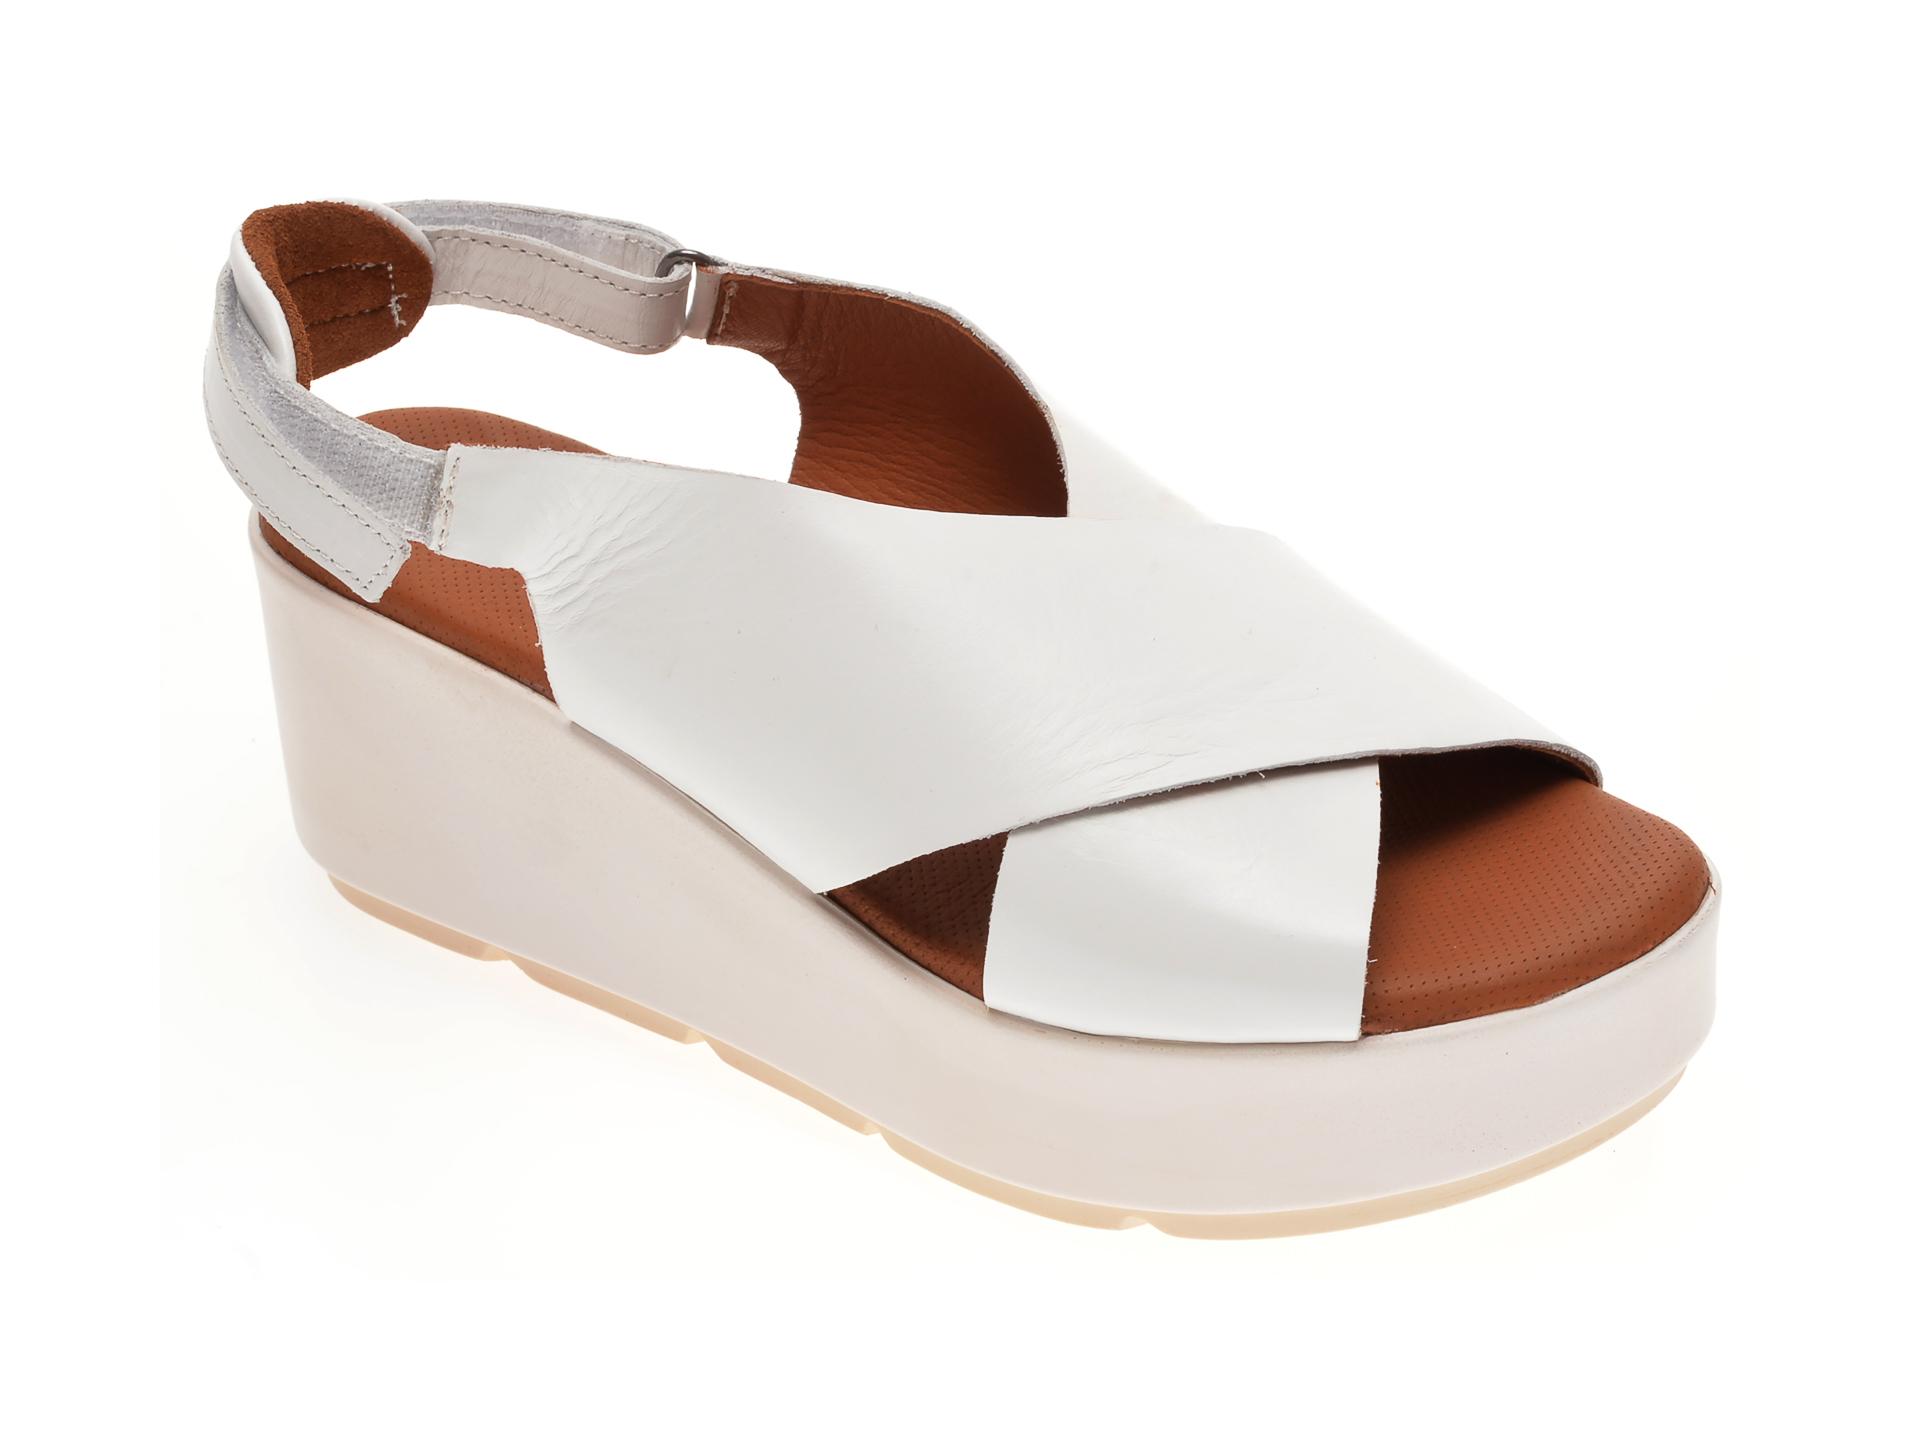 Sandale BABOOS albe, 2520, din piele naturala imagine